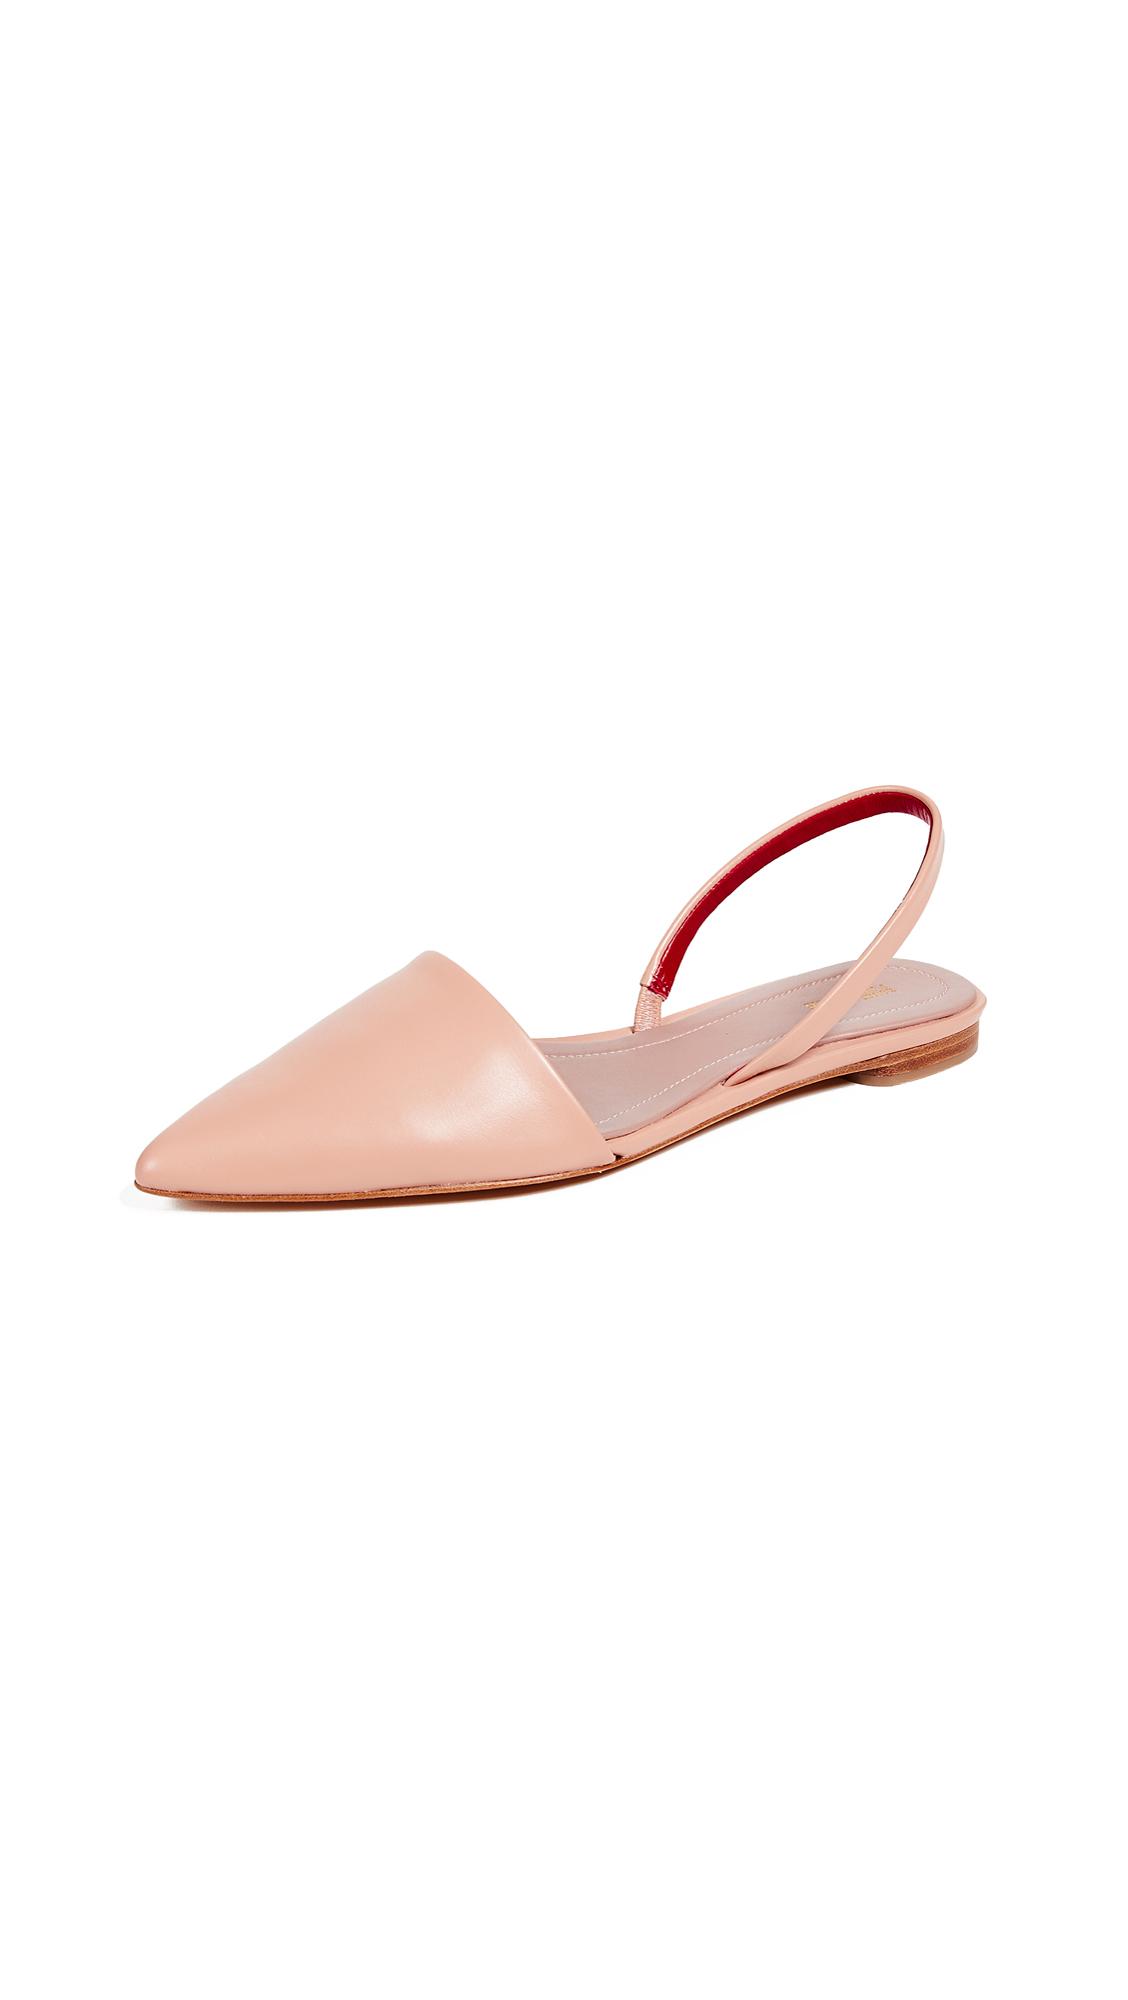 Diane von Furstenberg Koko Slingback Flats - Pink Sand